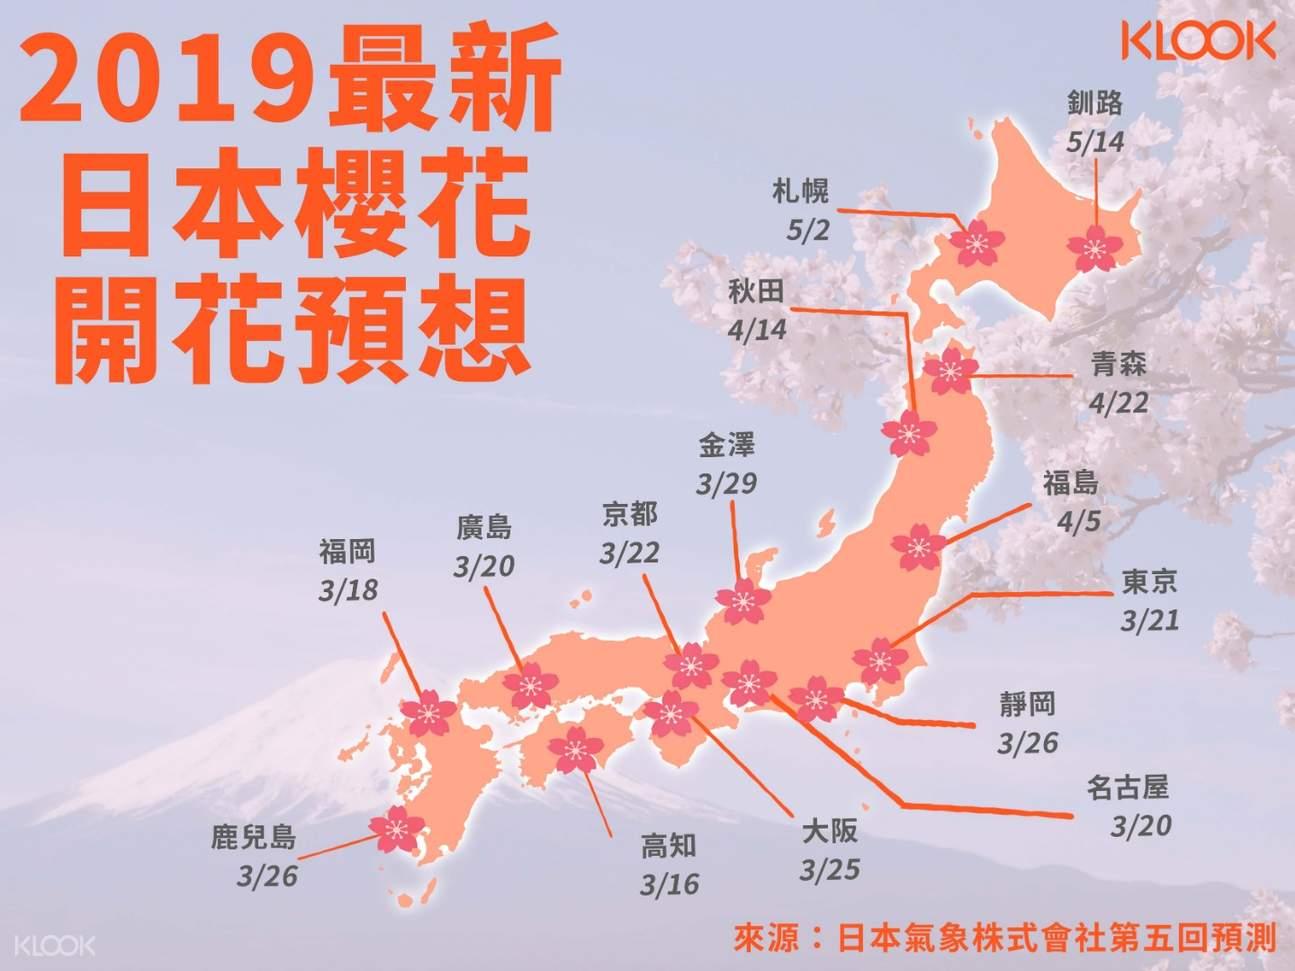 JR Pass 東日本東北地區鐵路周遊券